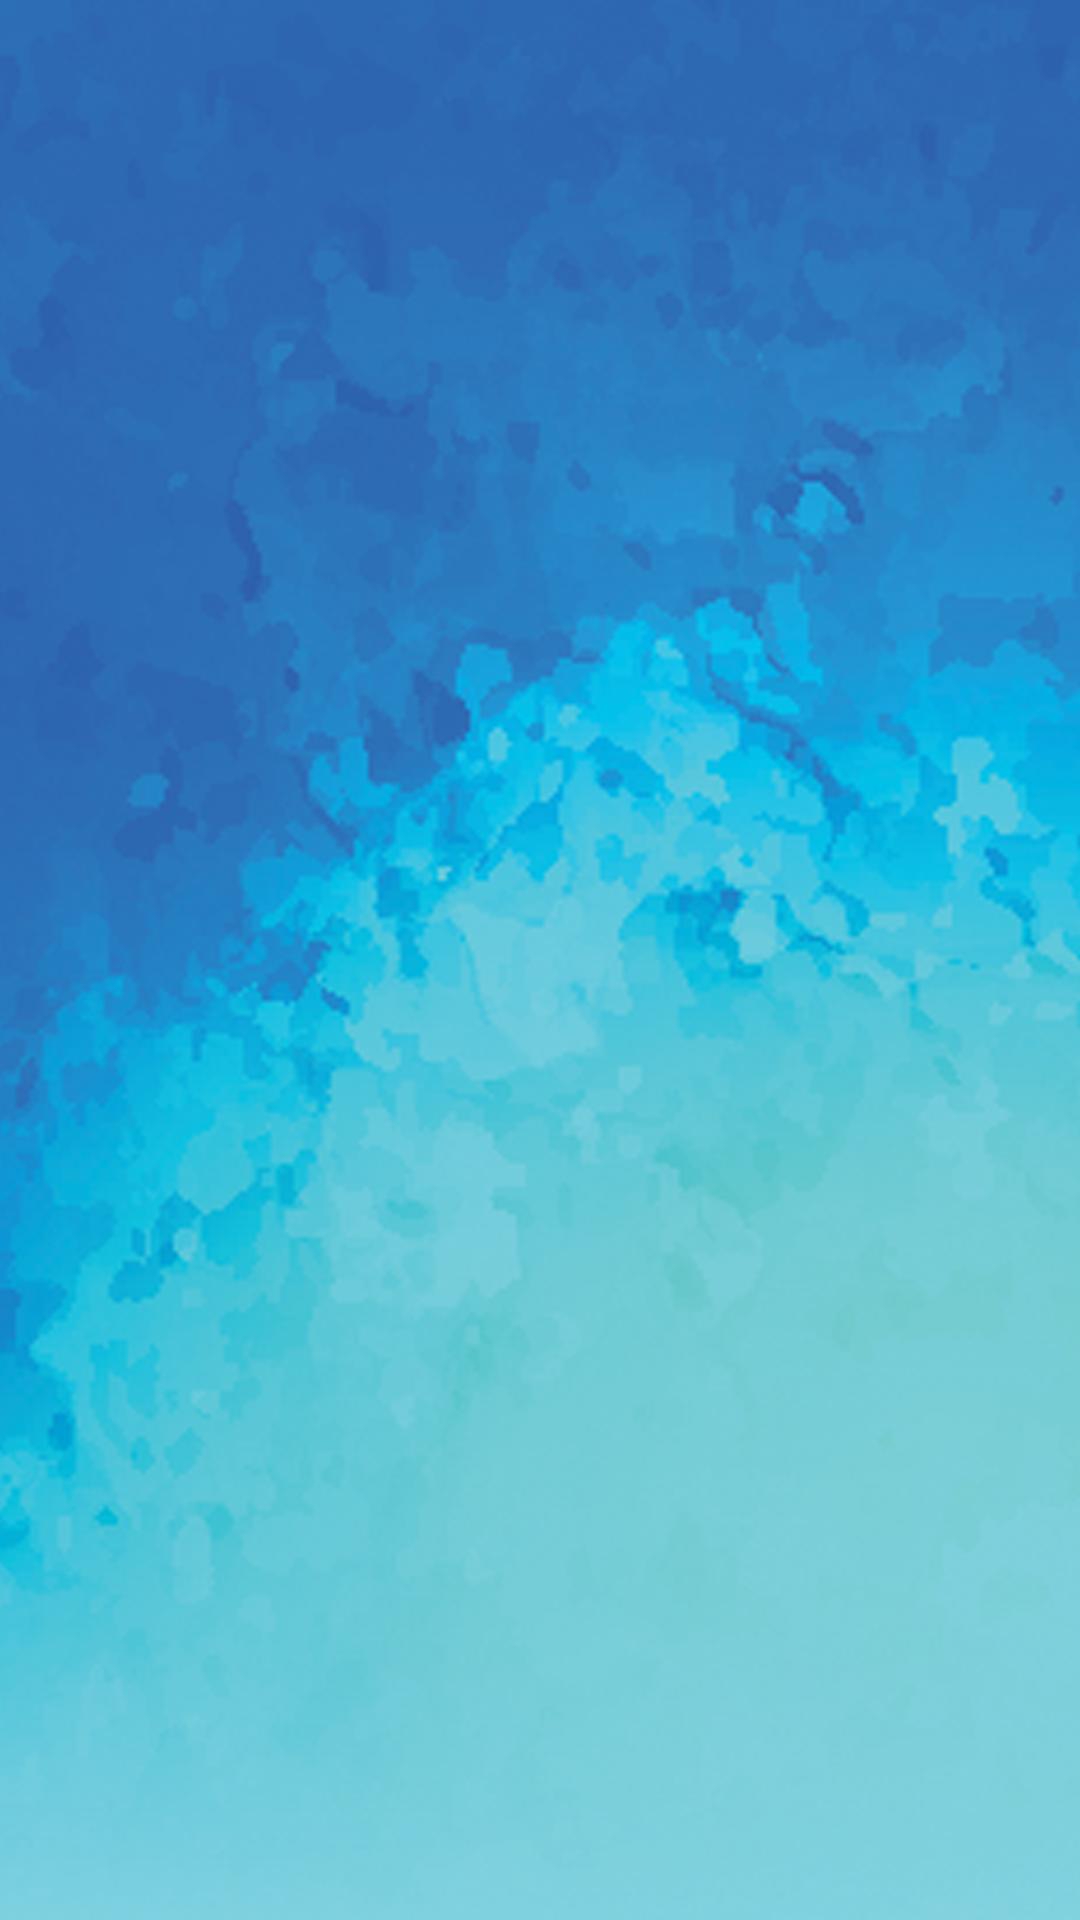 Watercolor Wallpaper Iphone At Getdrawingscom Free For